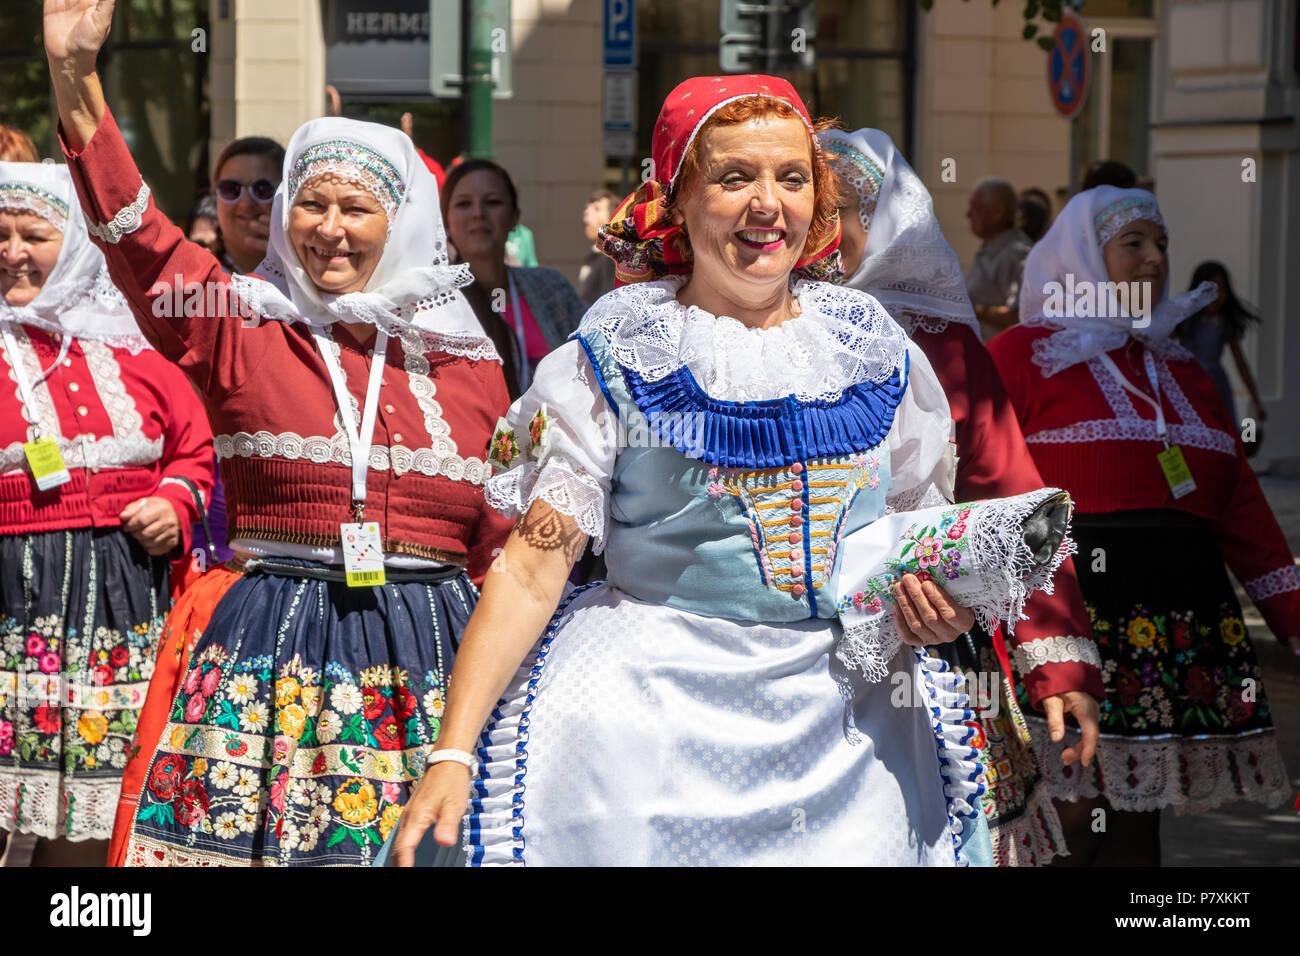 Bohemia Traditional Dress Photos   Bohemia Traditional Dress Images ... 5e766eed422